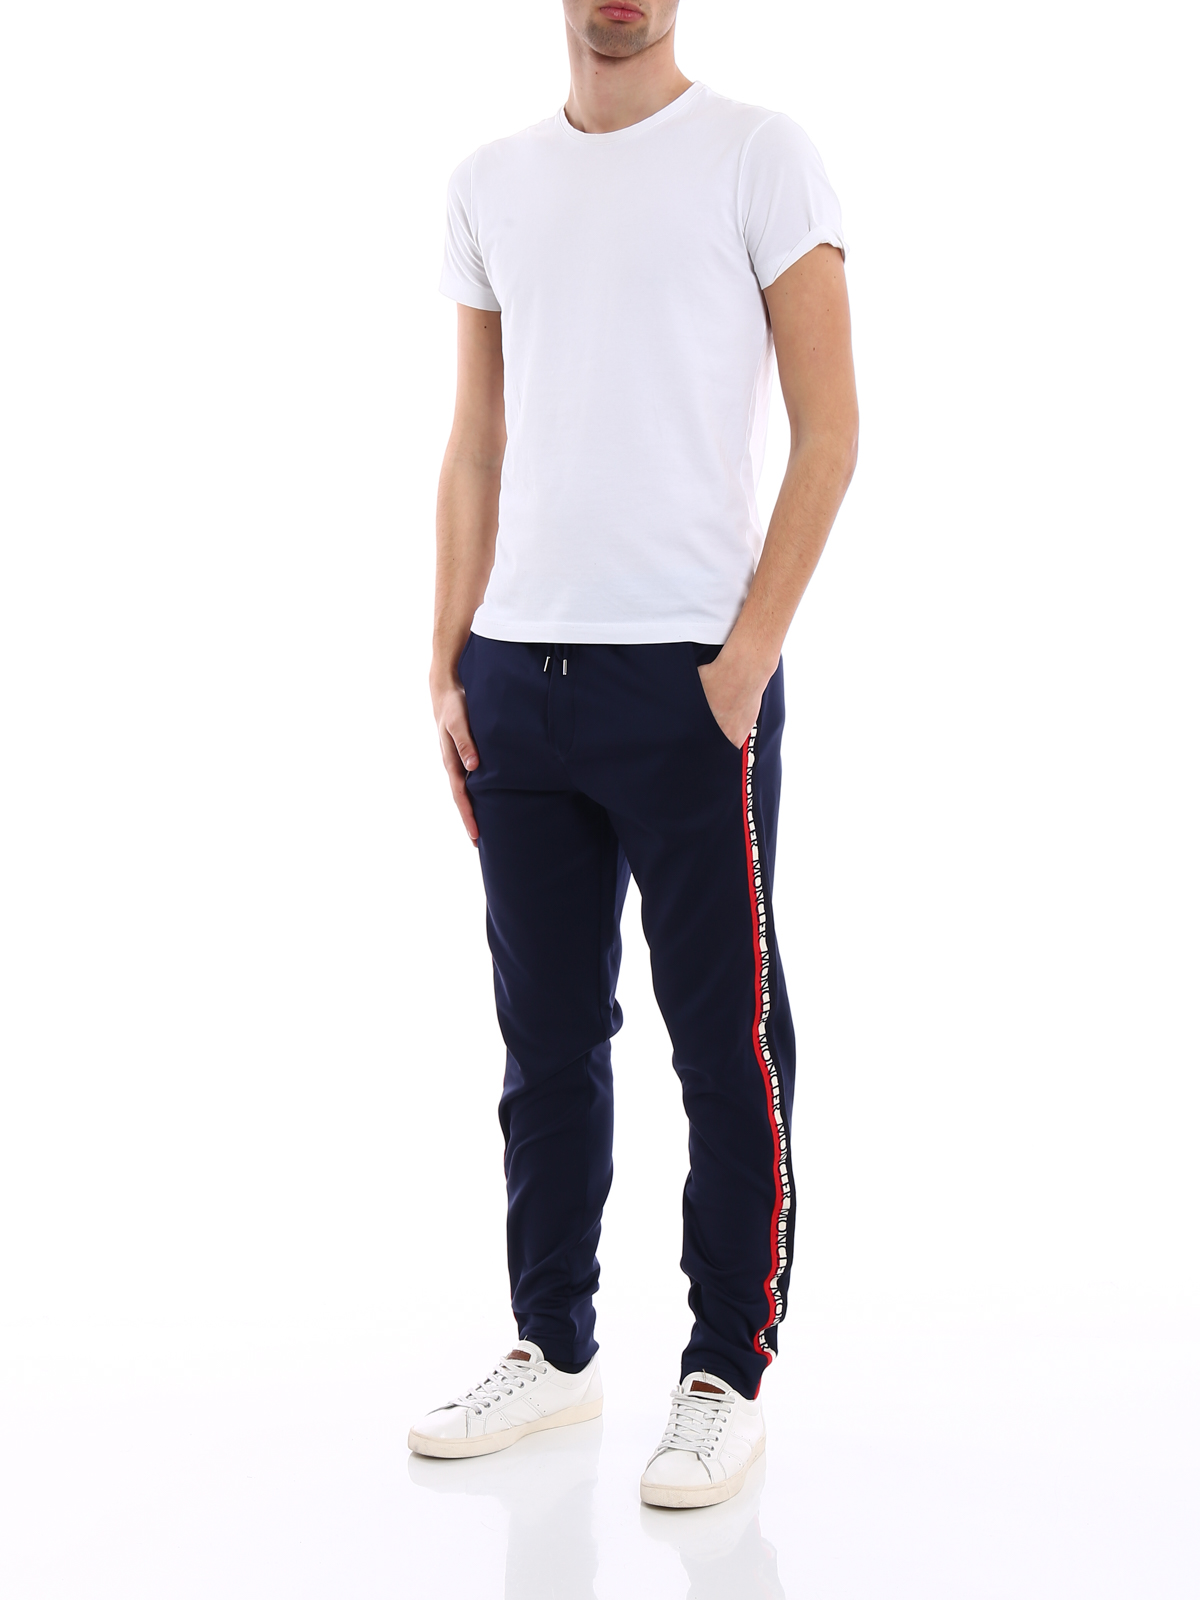 pantaloni moncler uomo